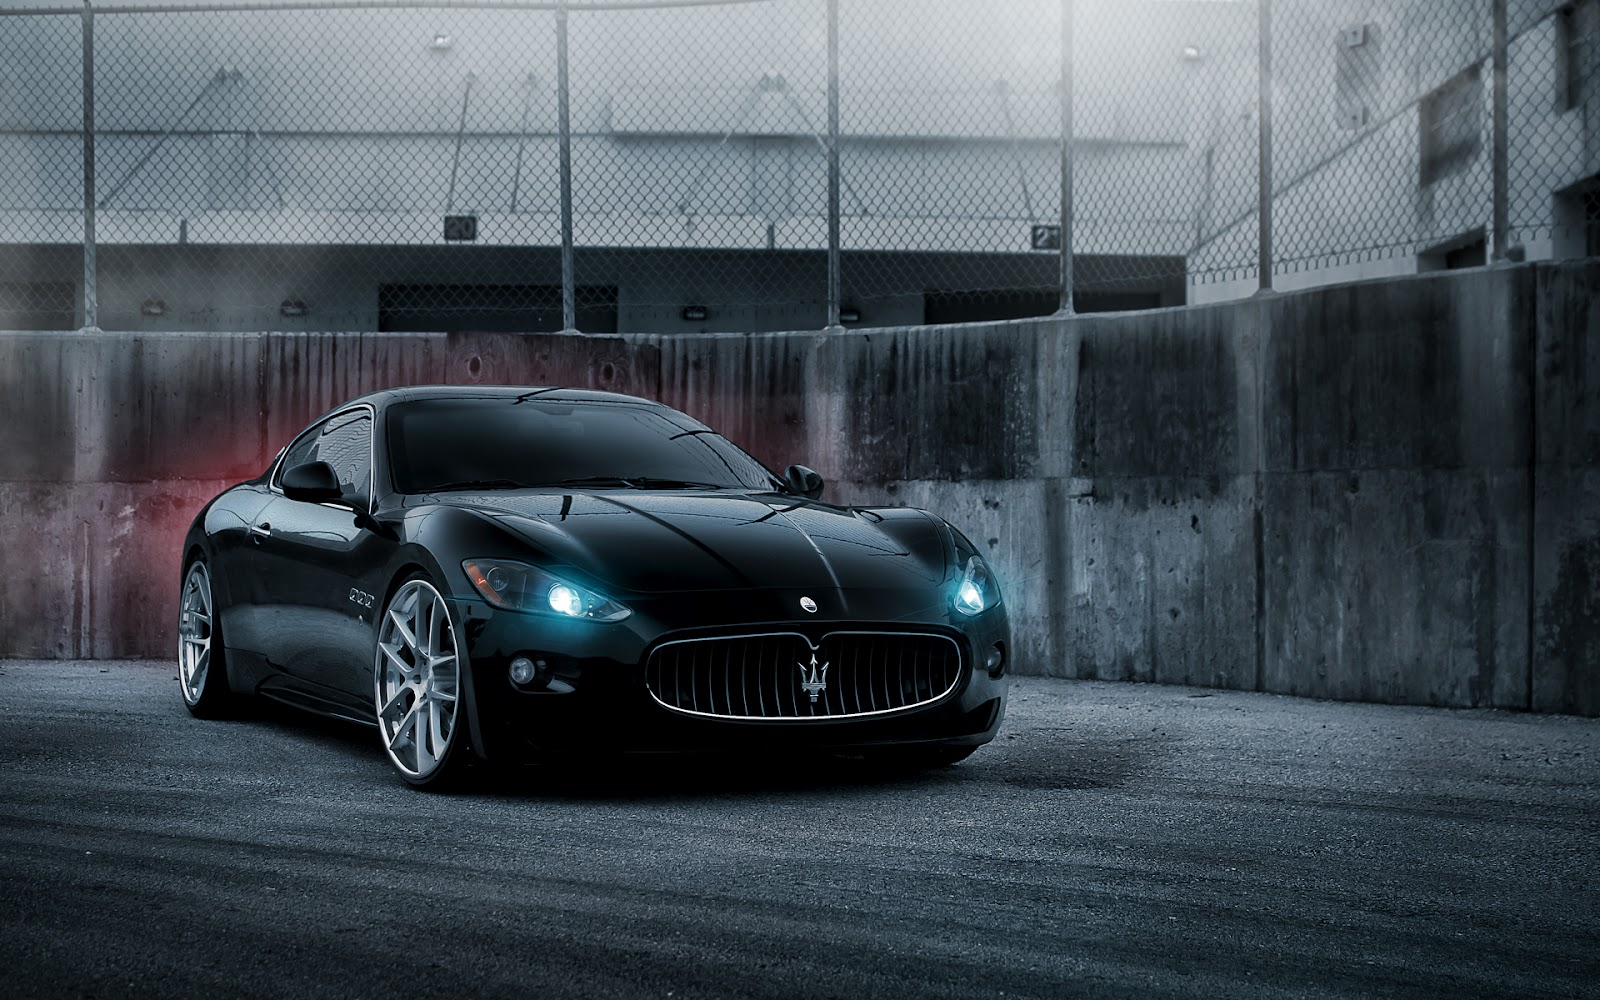 Wallpapers HD Maserati Granturismo Carros Deportivos